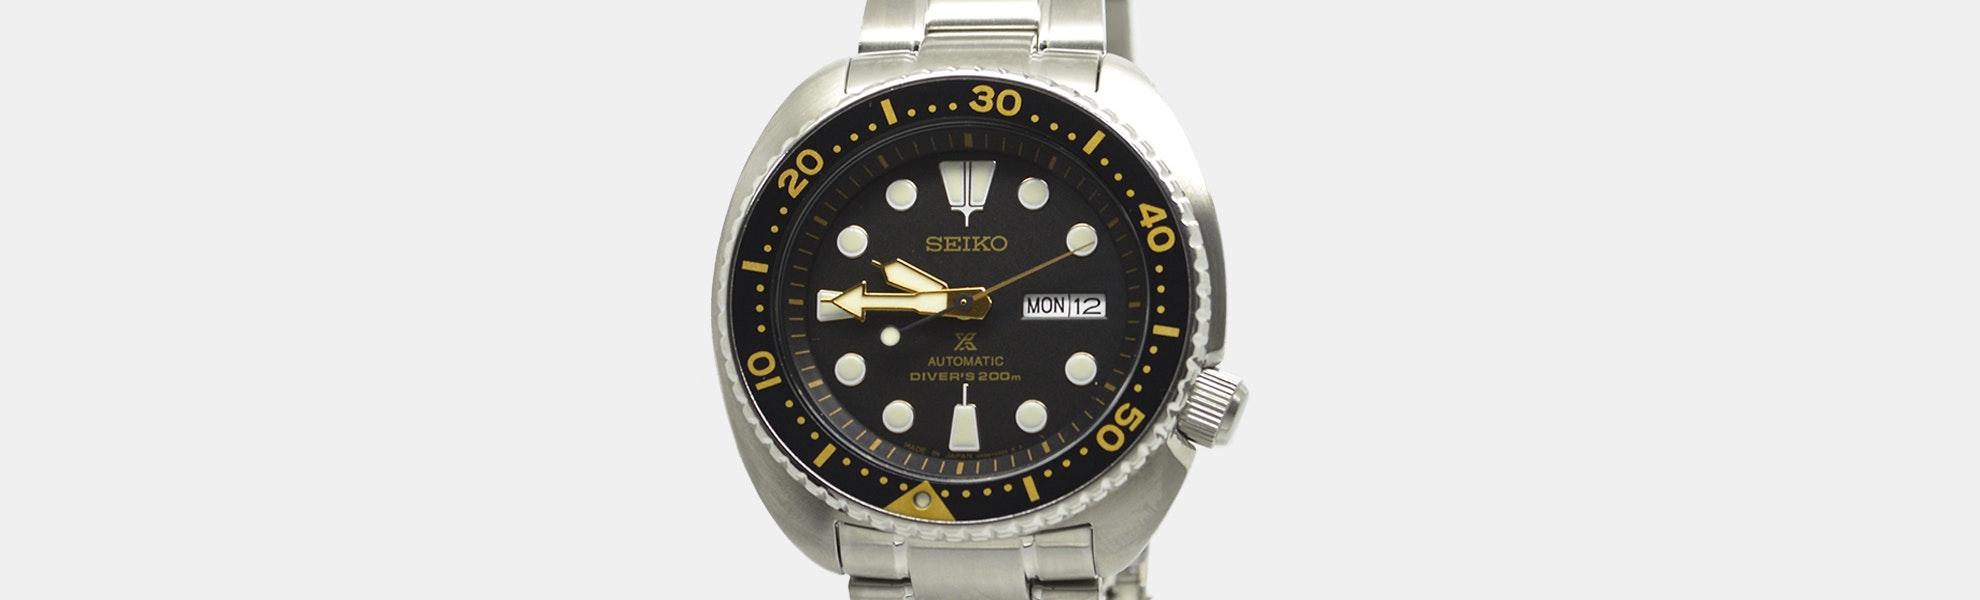 "Seiko ""Turtle"" SRP77X Automatic Watch"